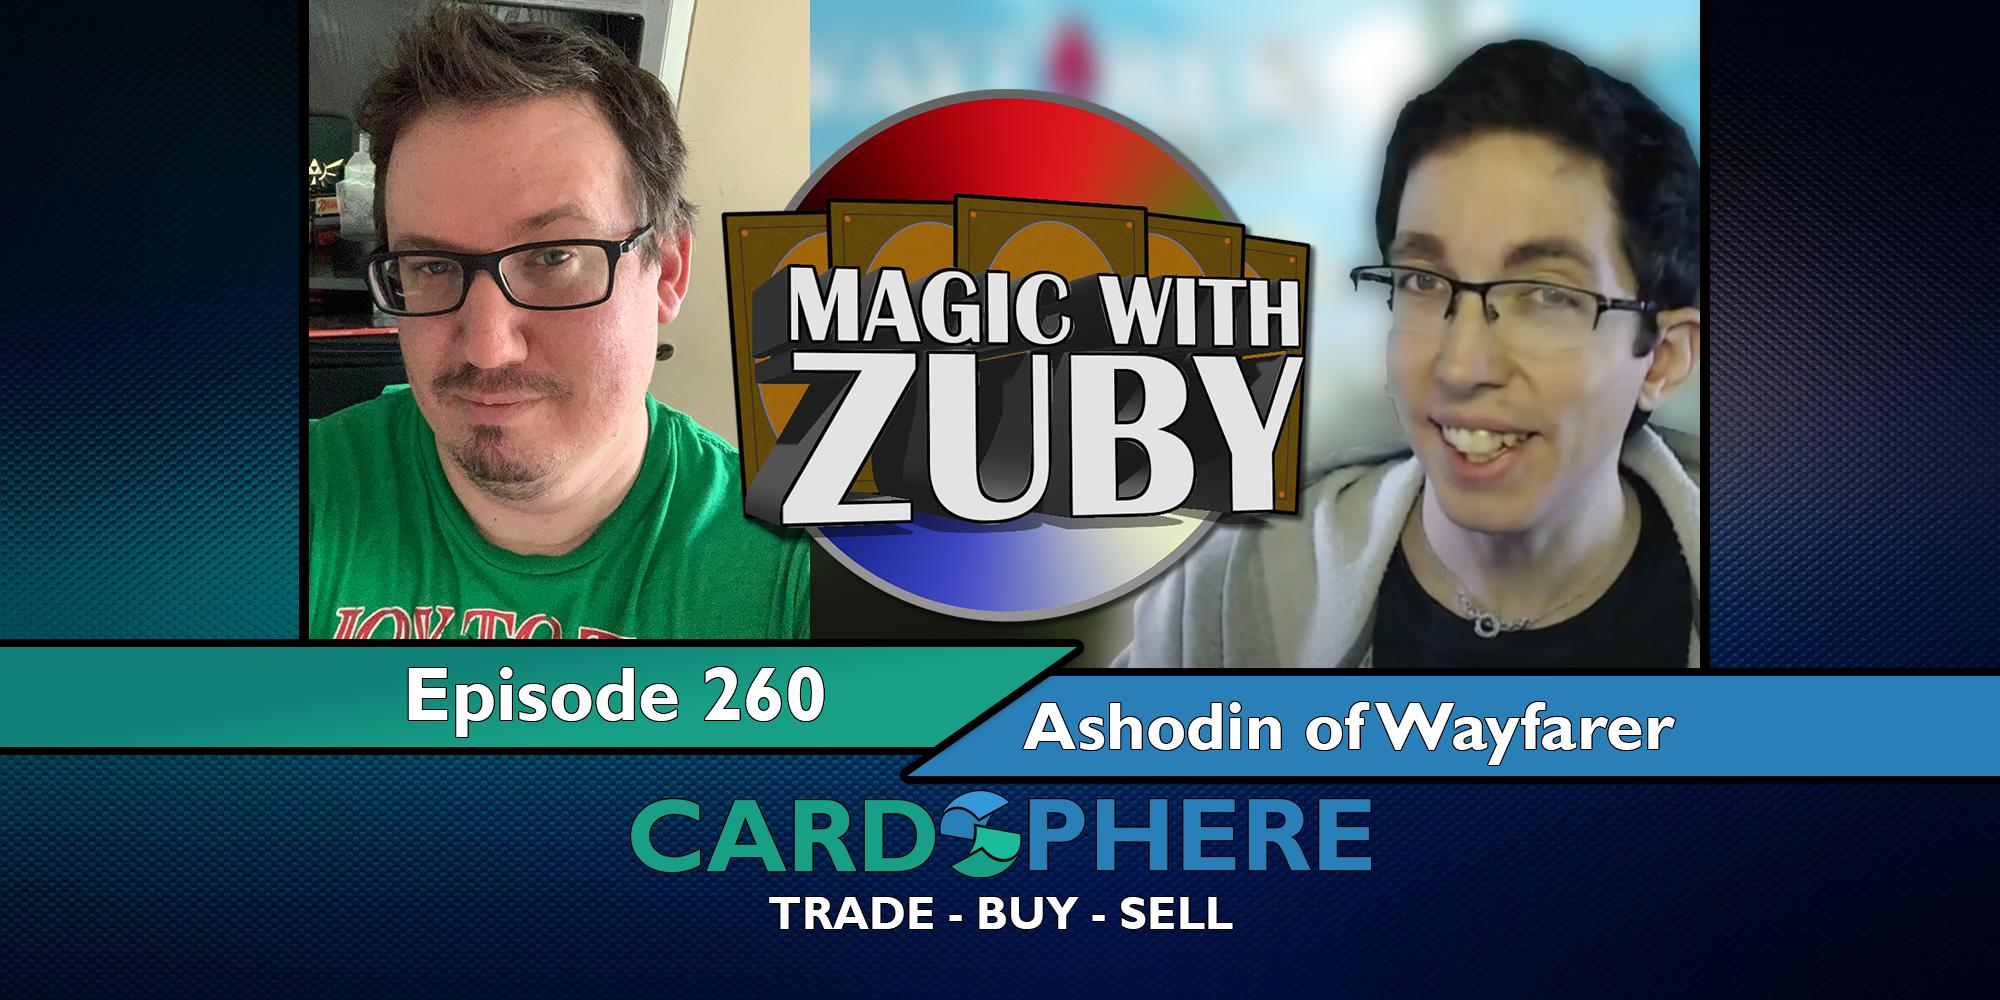 Magic With Zuby Episode 260 - Ashodin, Lead Dev of The Wayfarer Format